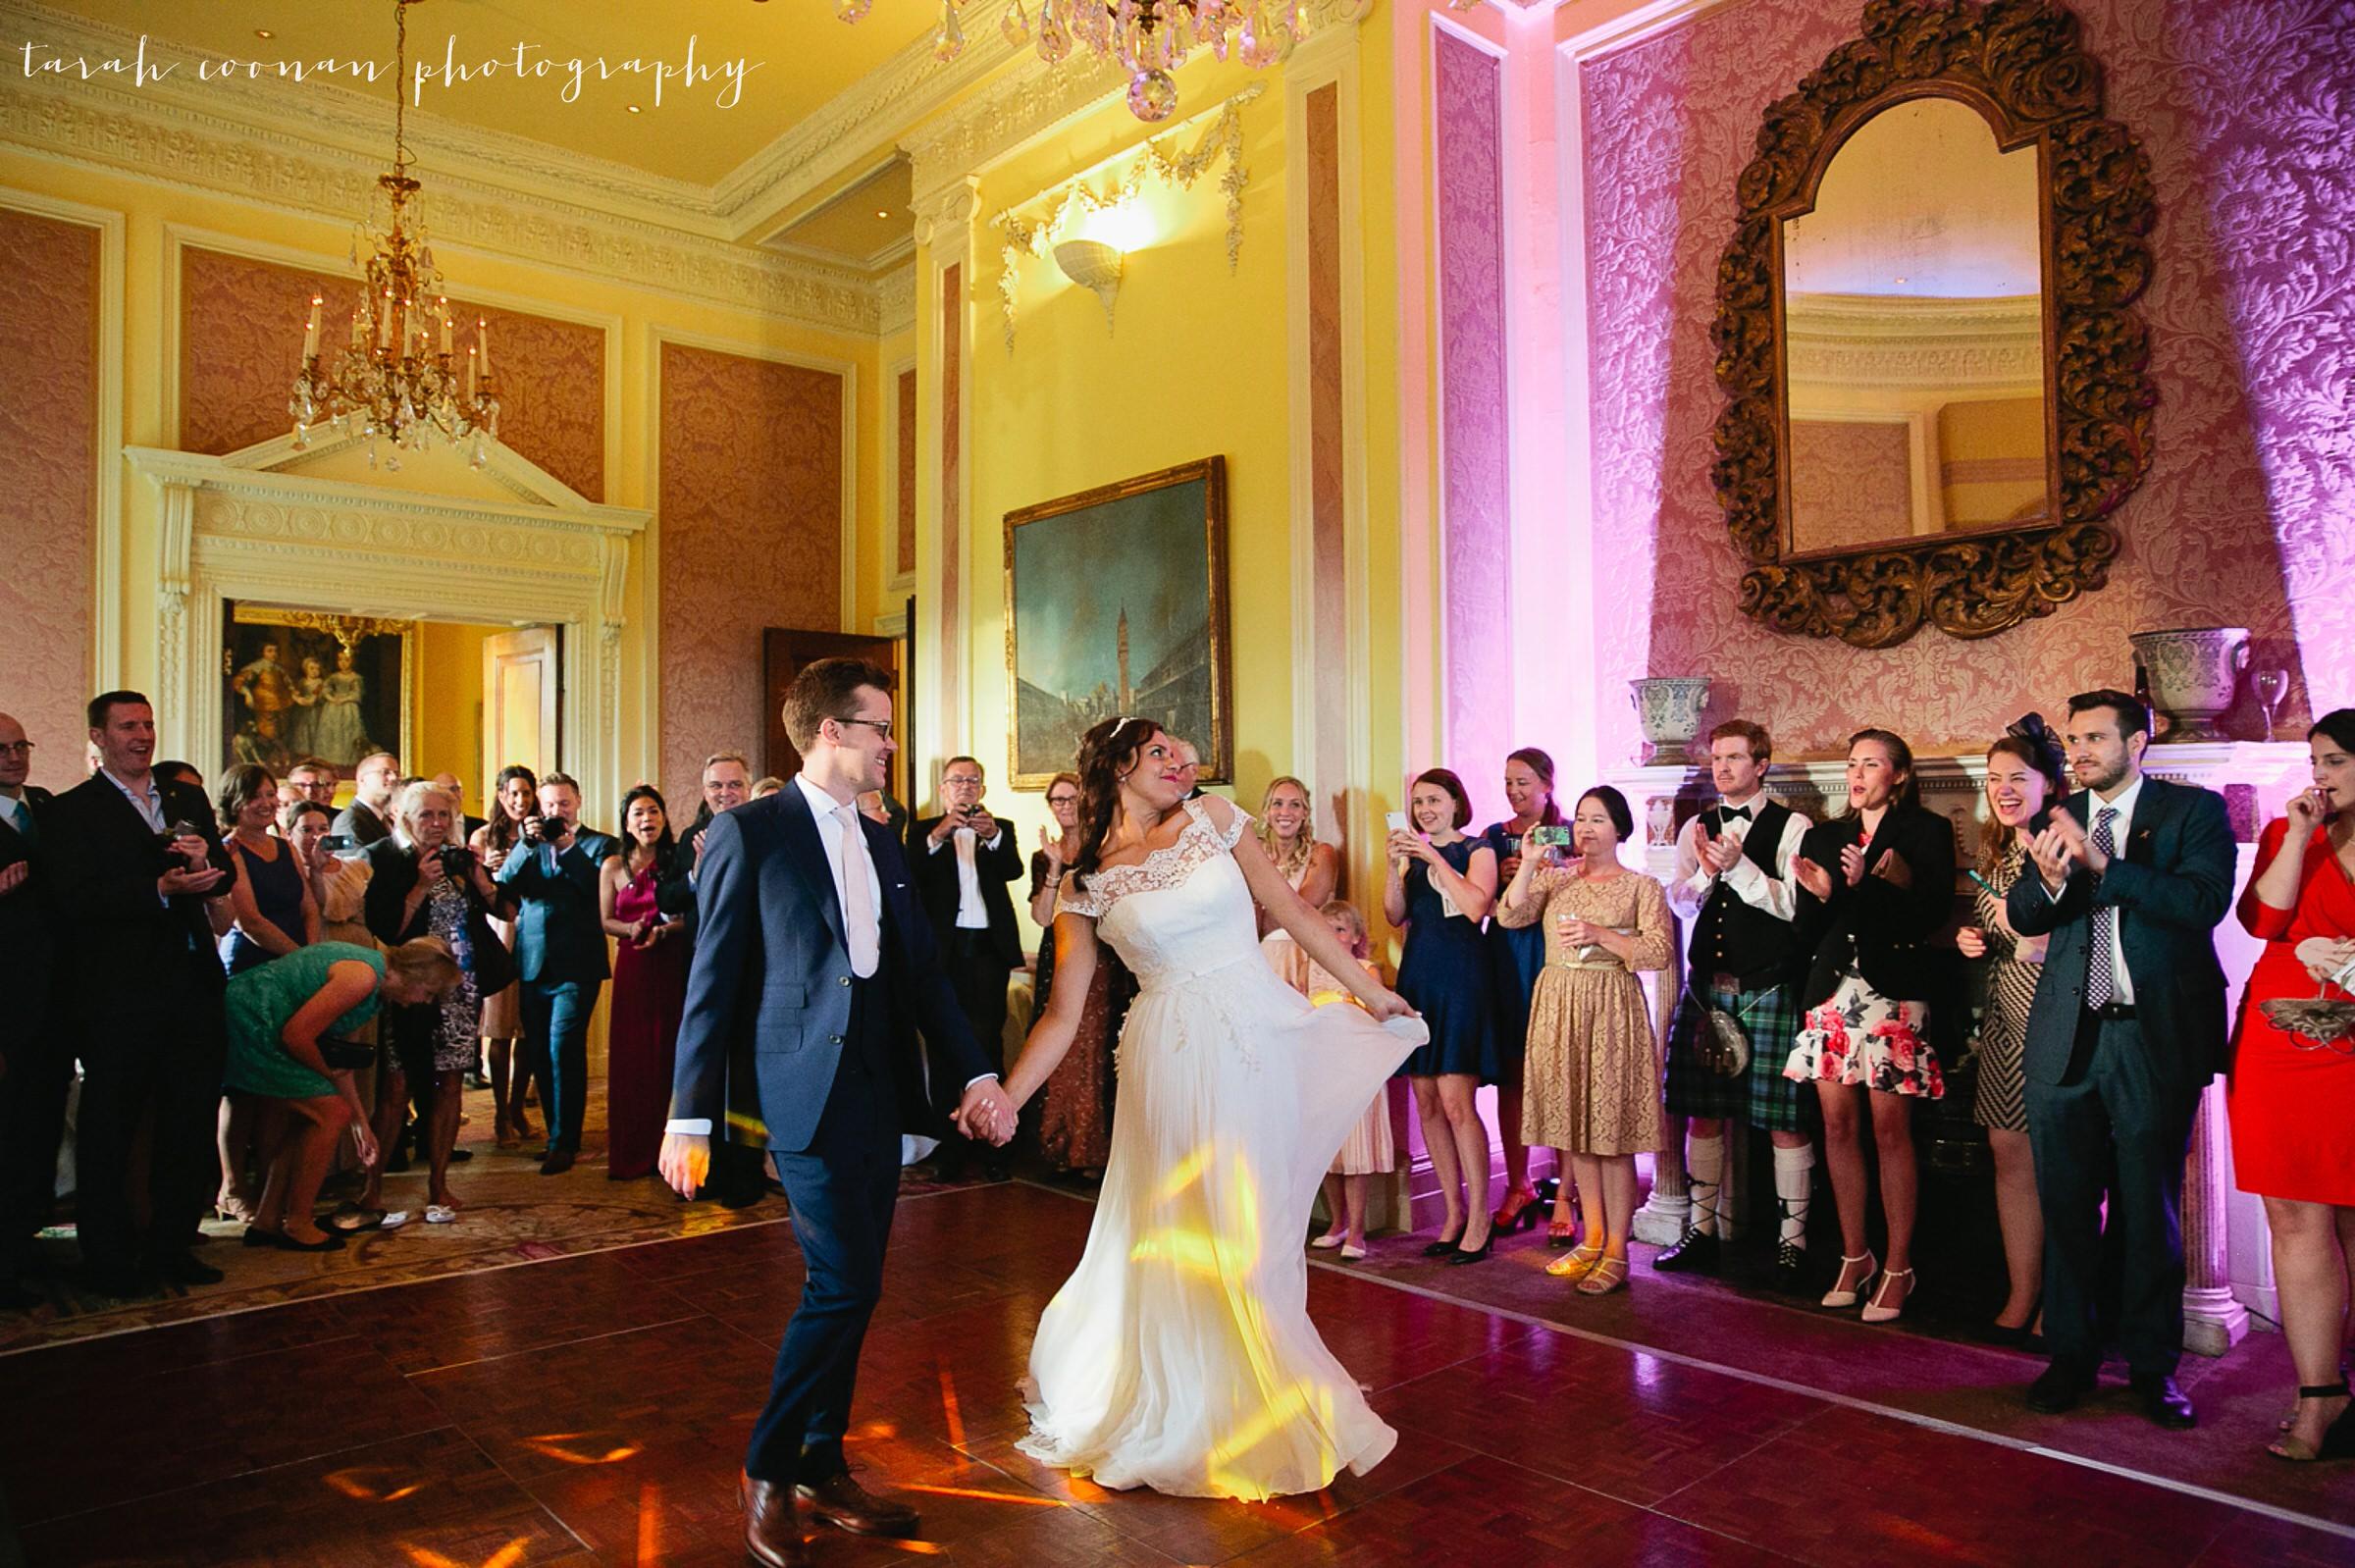 brighton-wedding-photographer95